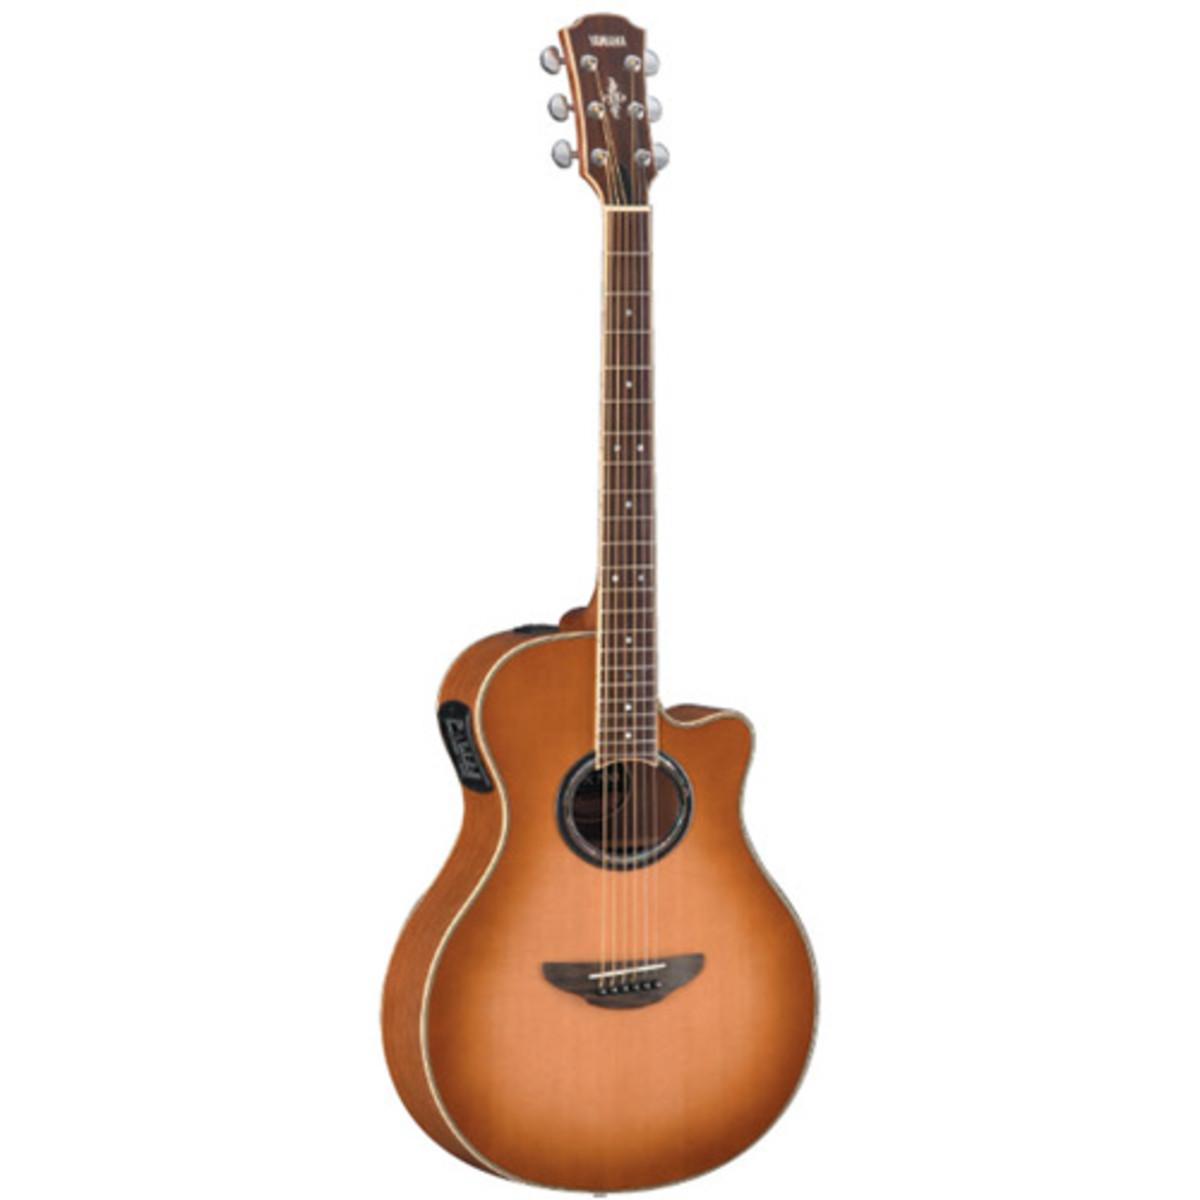 yamaha apx700 guitare electro acoustique sunburst. Black Bedroom Furniture Sets. Home Design Ideas